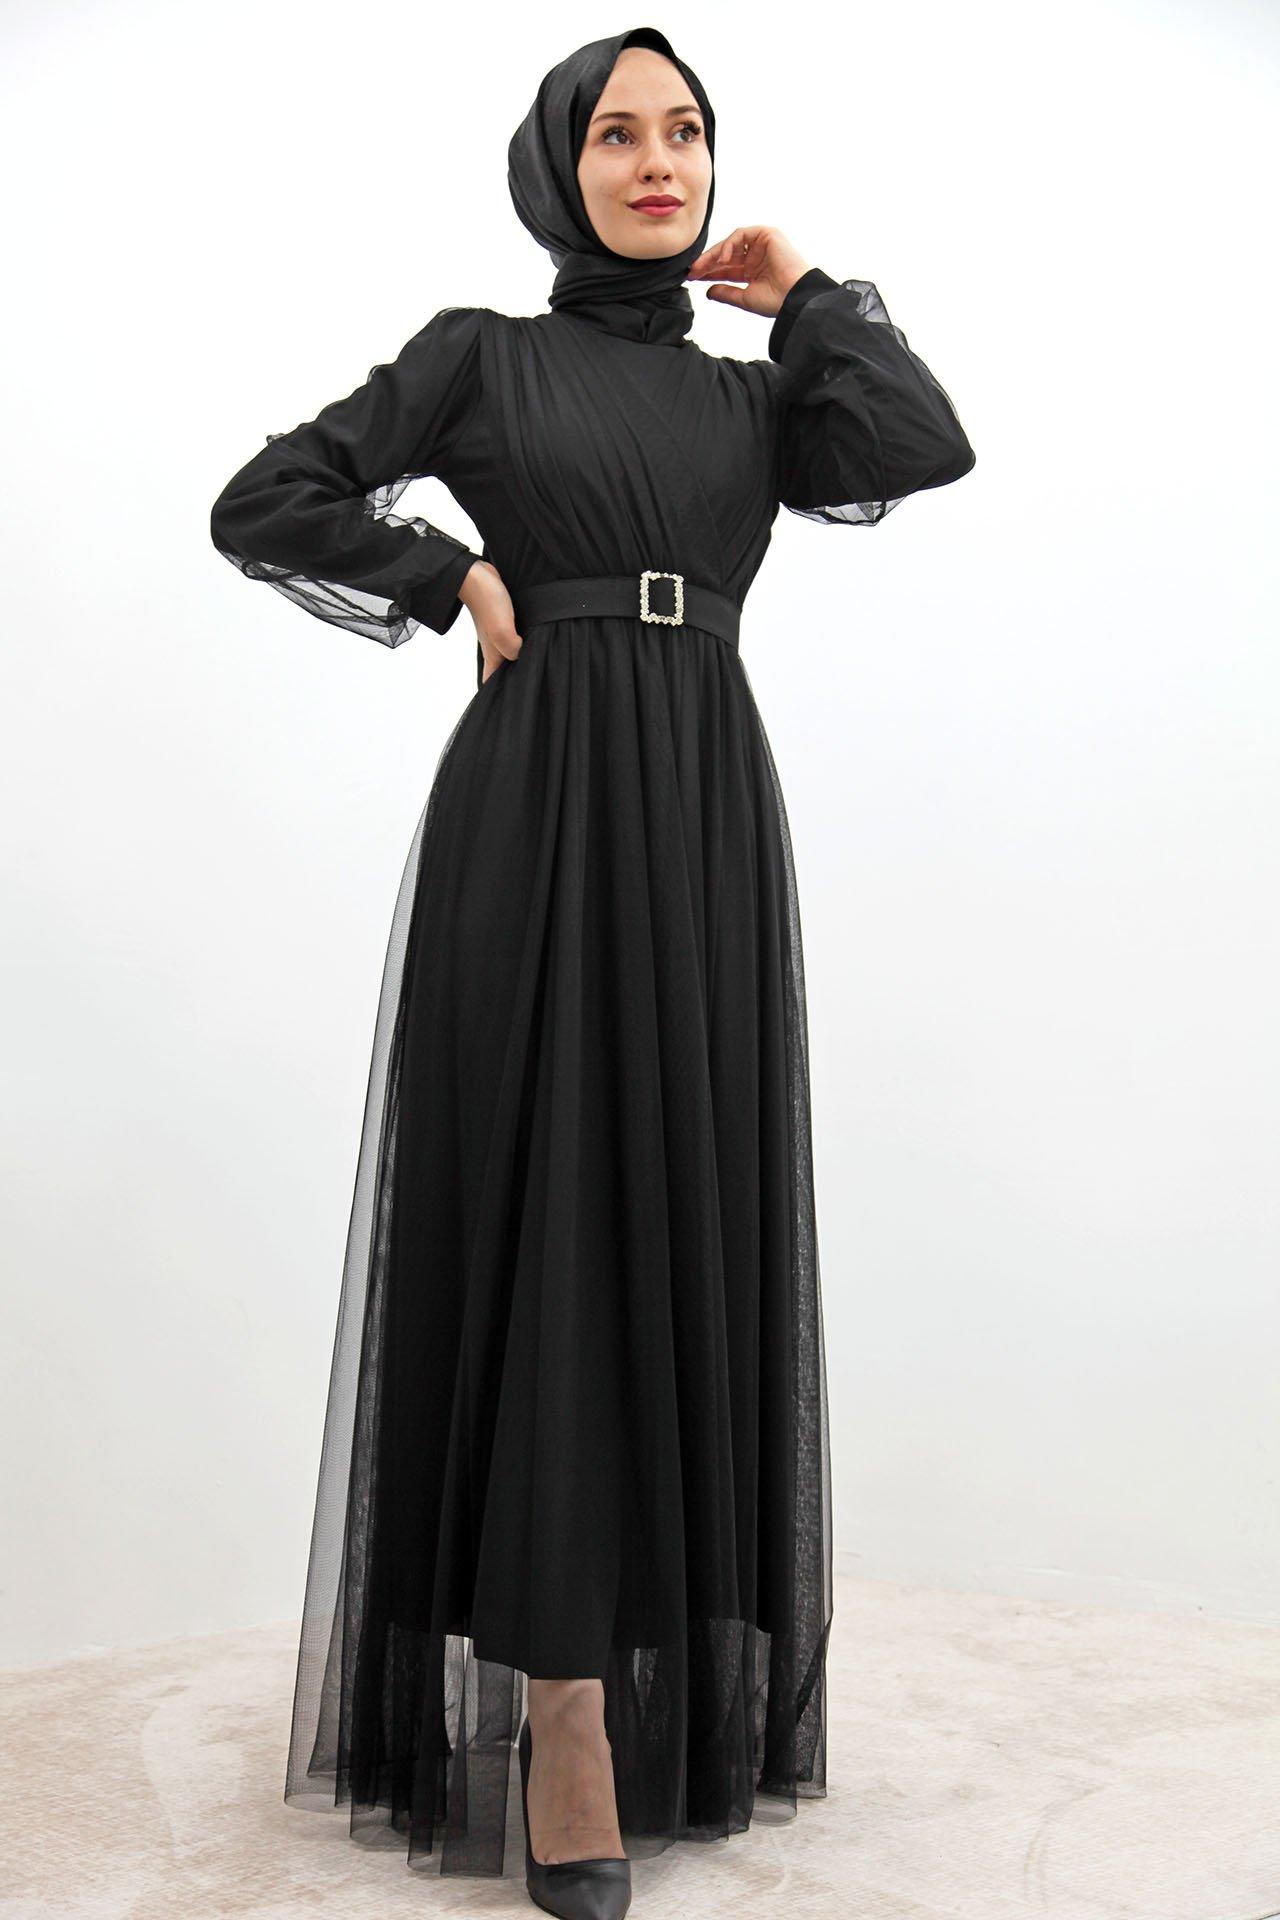 GİZAGİYİM - Önü Çapraz Tül Elbise Siyah